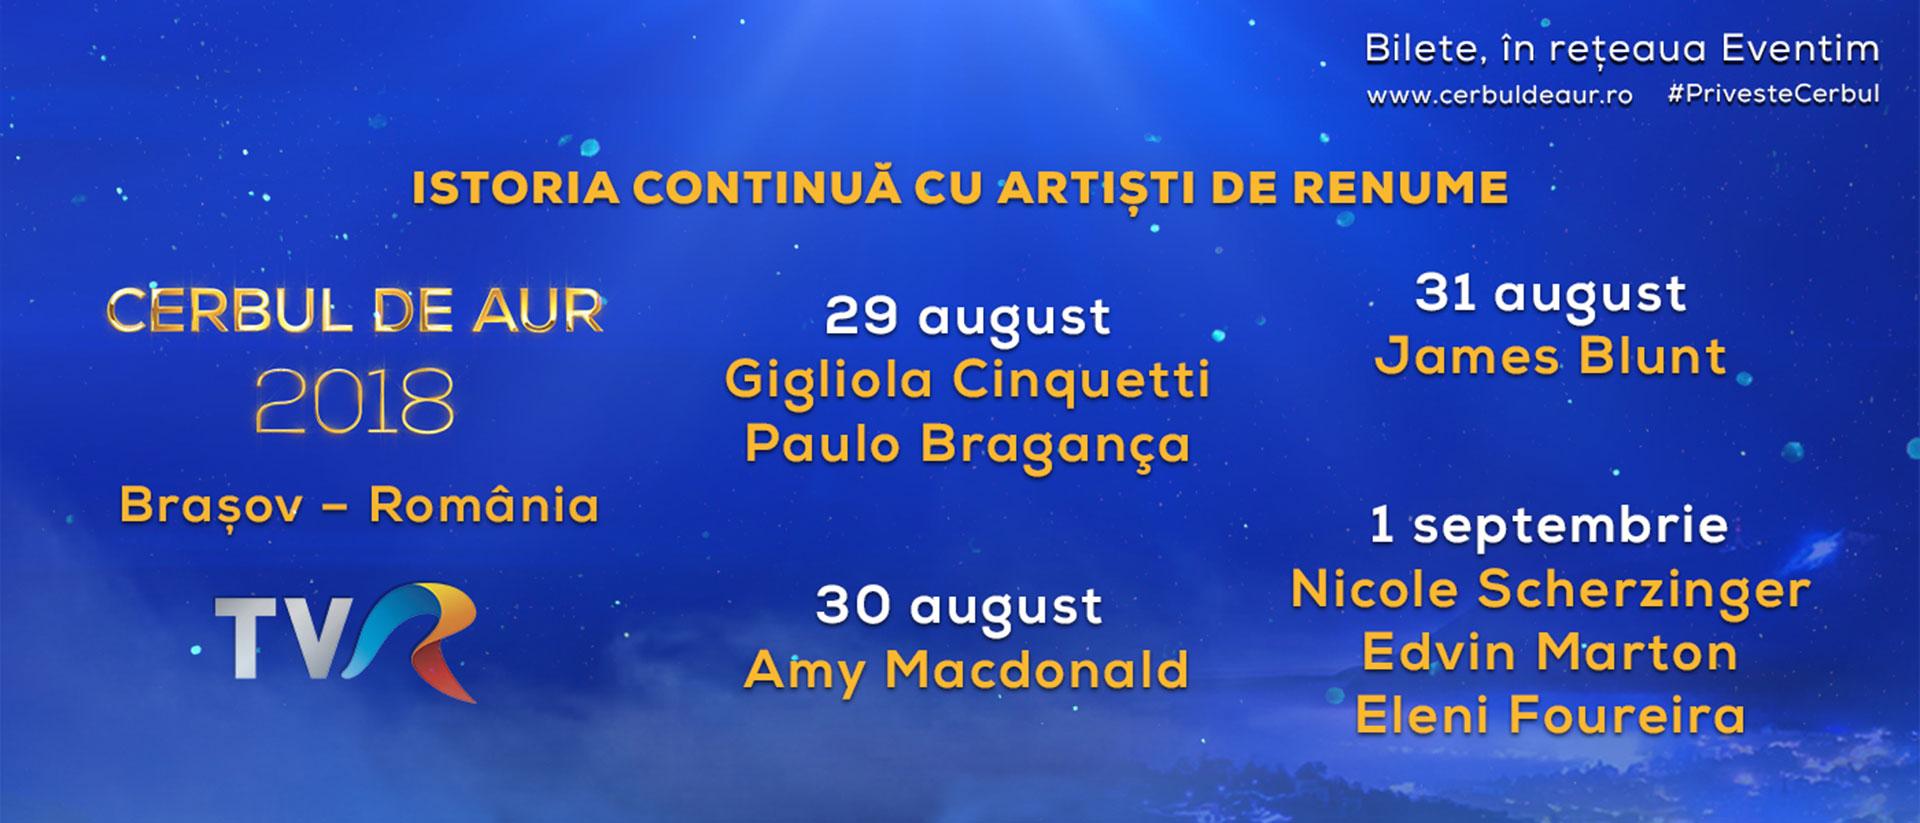 Concert International singers, Cerbul de Aur 2018